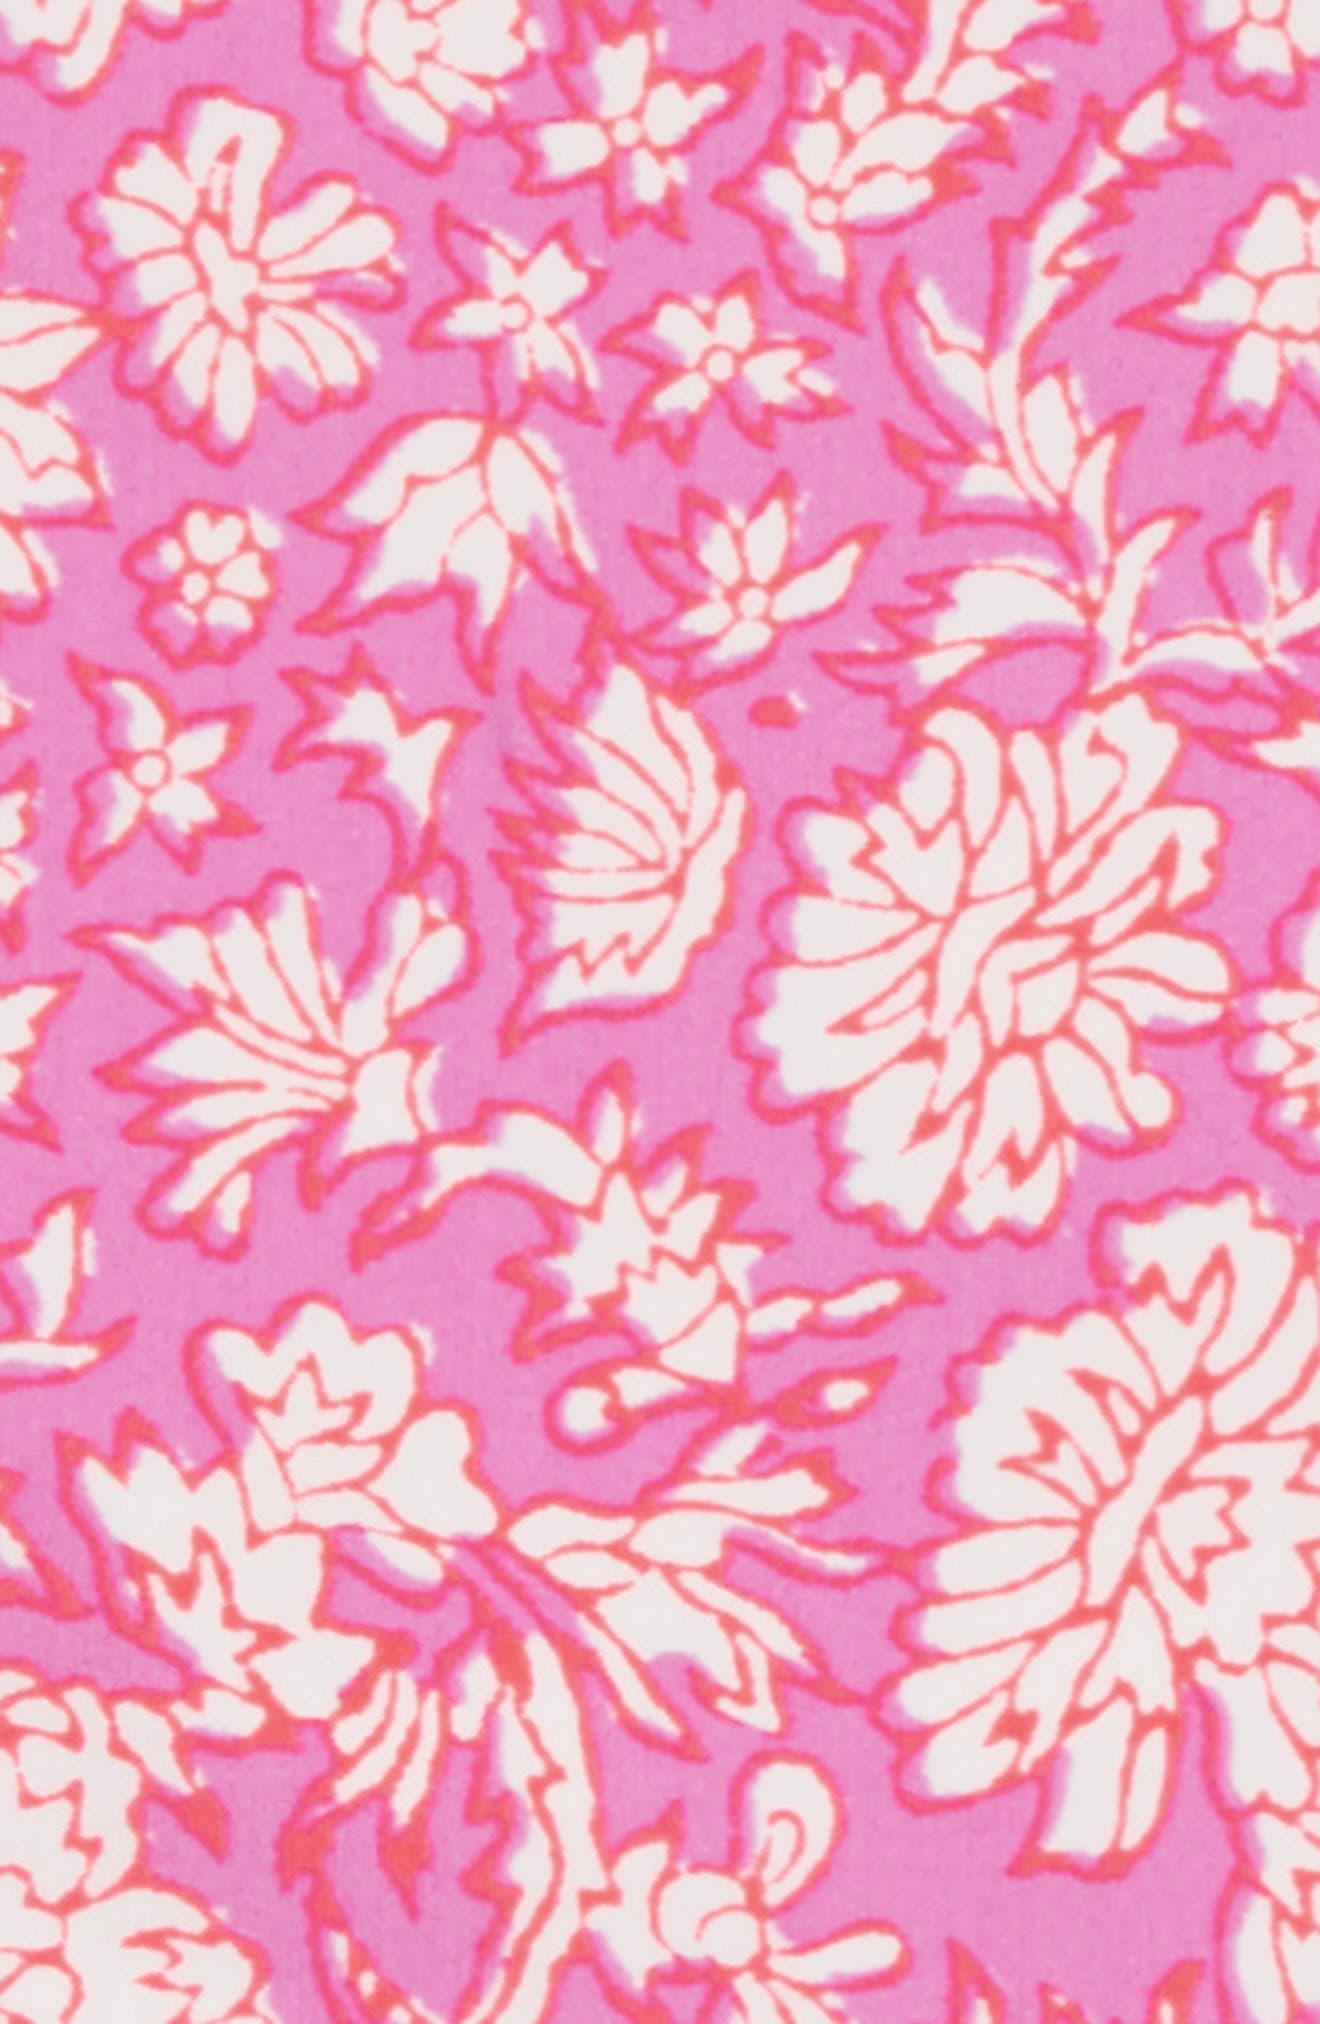 SZ Blockprints<sup>™</sup> Two-Piece Tankini Swimsuit,                             Alternate thumbnail 2, color,                             Ivory Lavender Multi